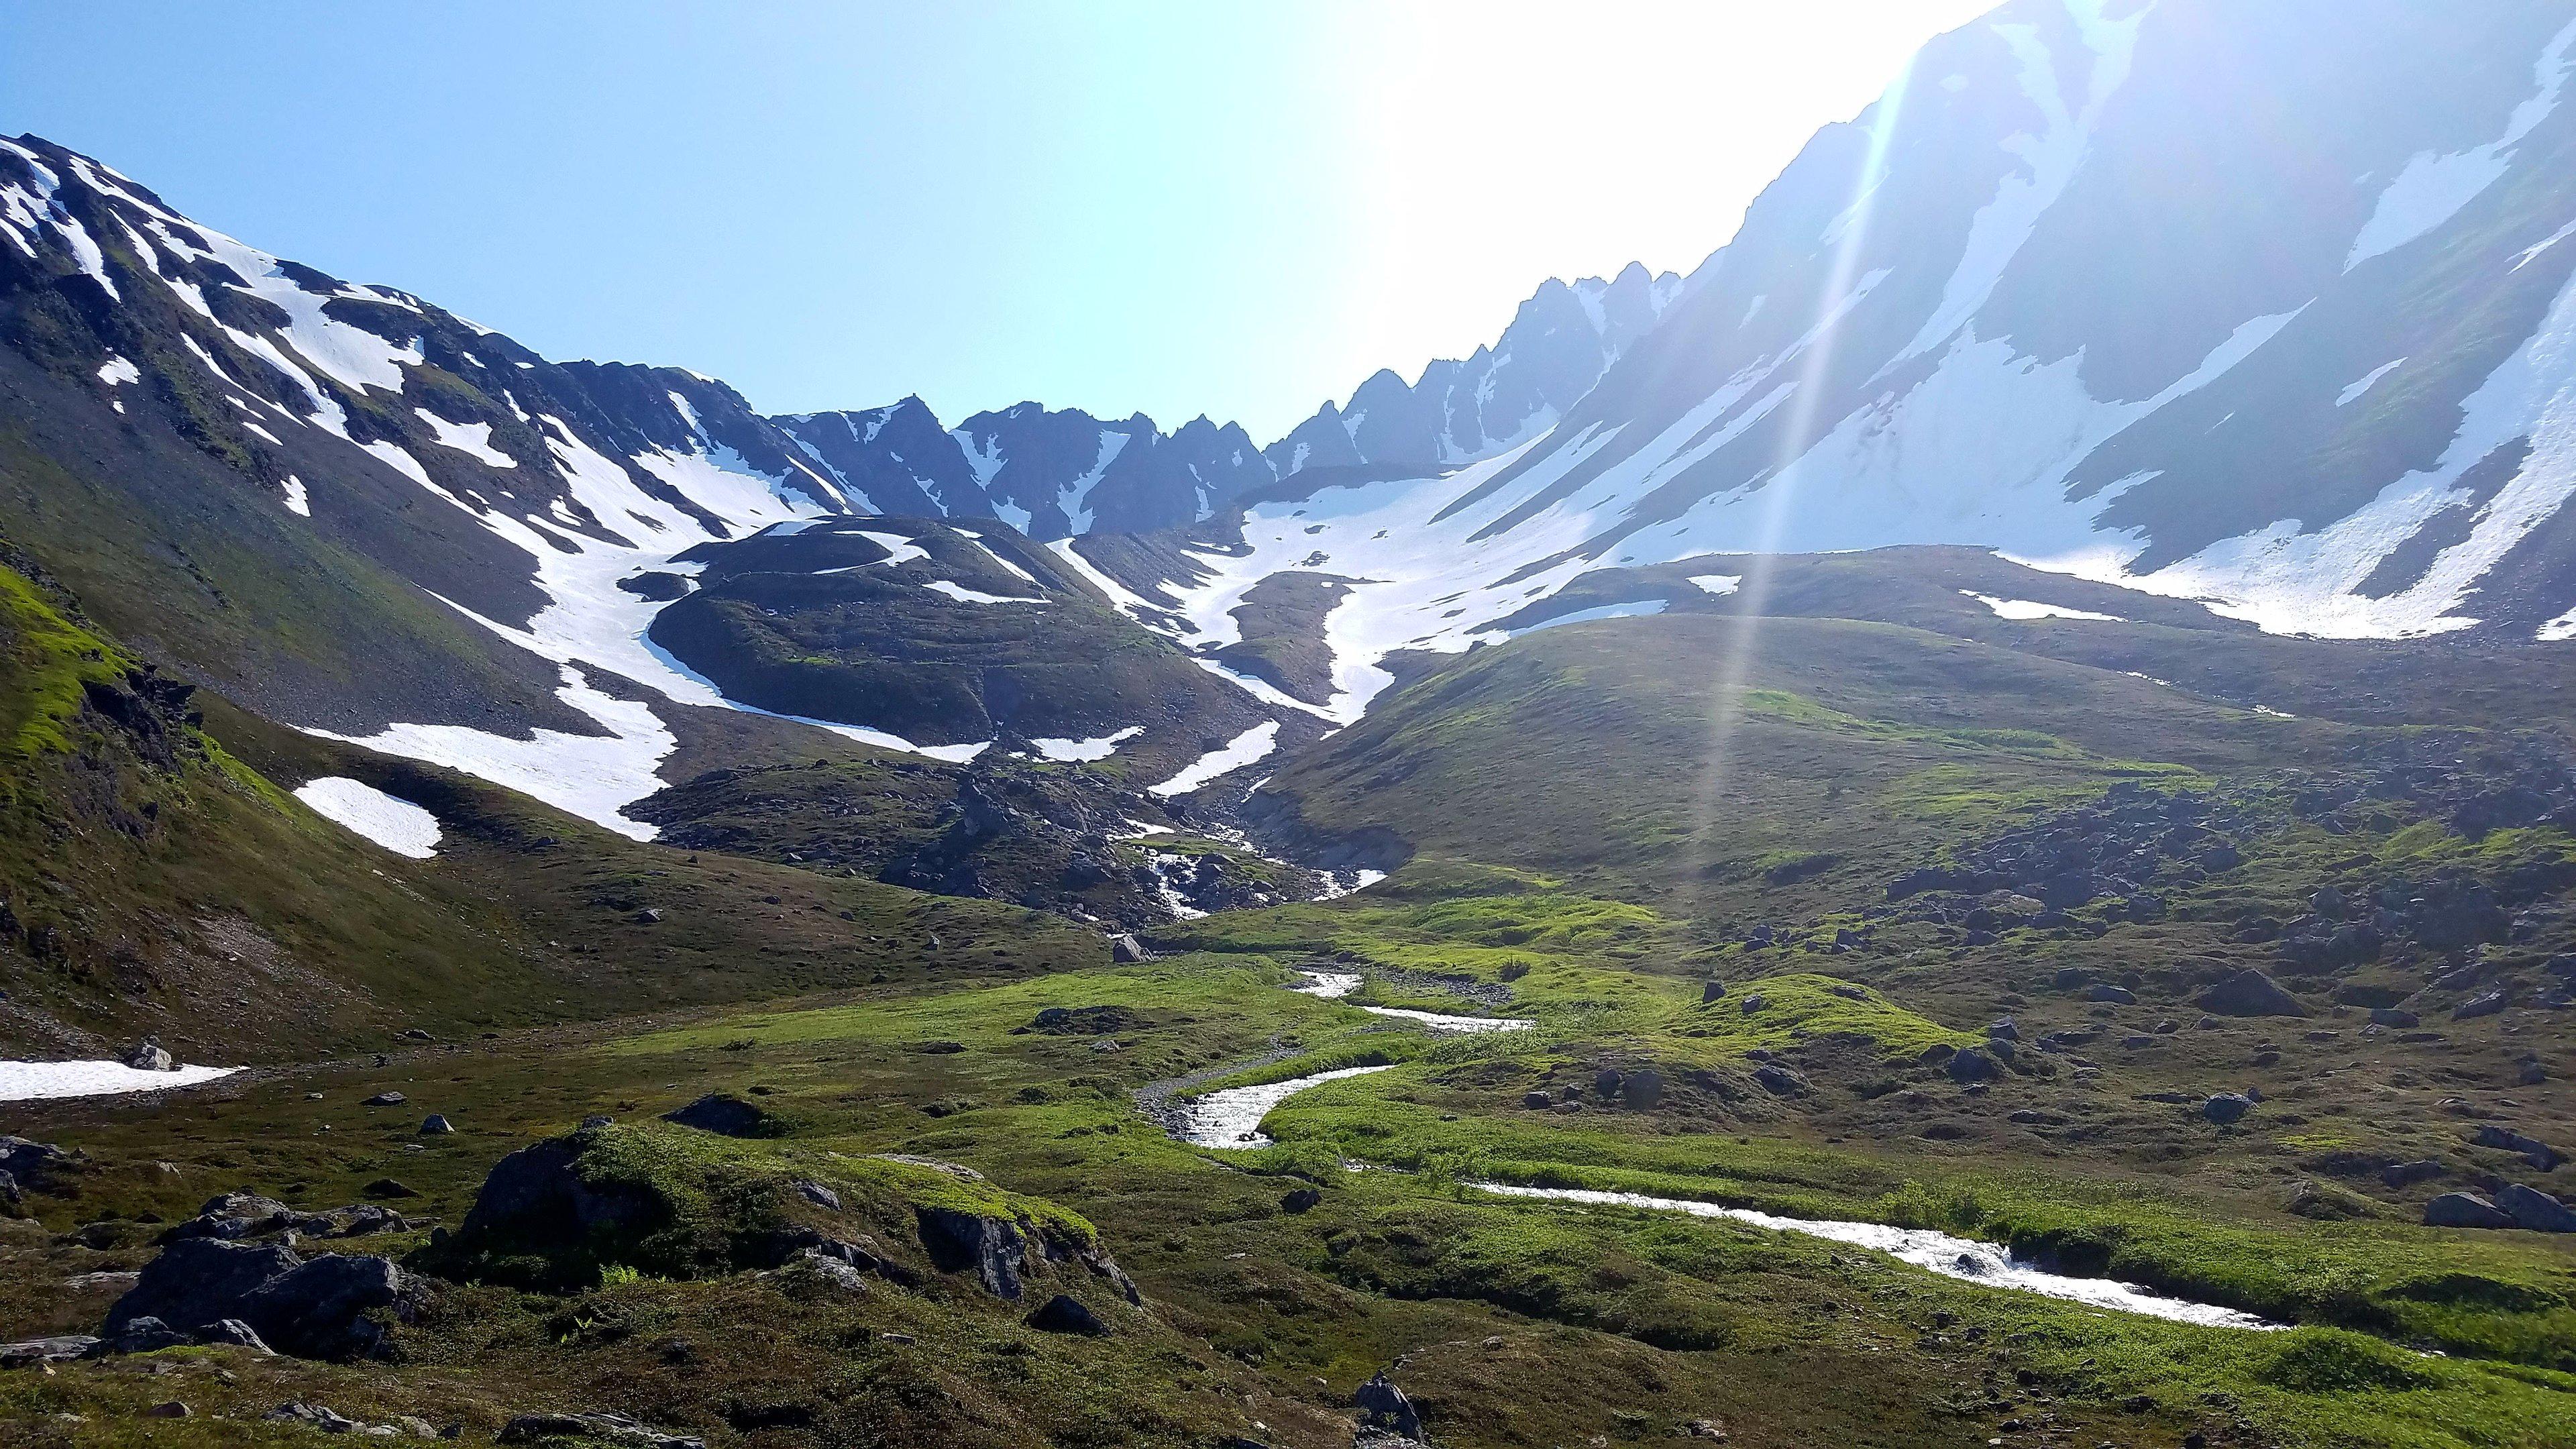 20180706_181346-jpg.44226_Hitchhiking Alaska Video Series_Hitchhiking_Squat the Planet_8:59 PM